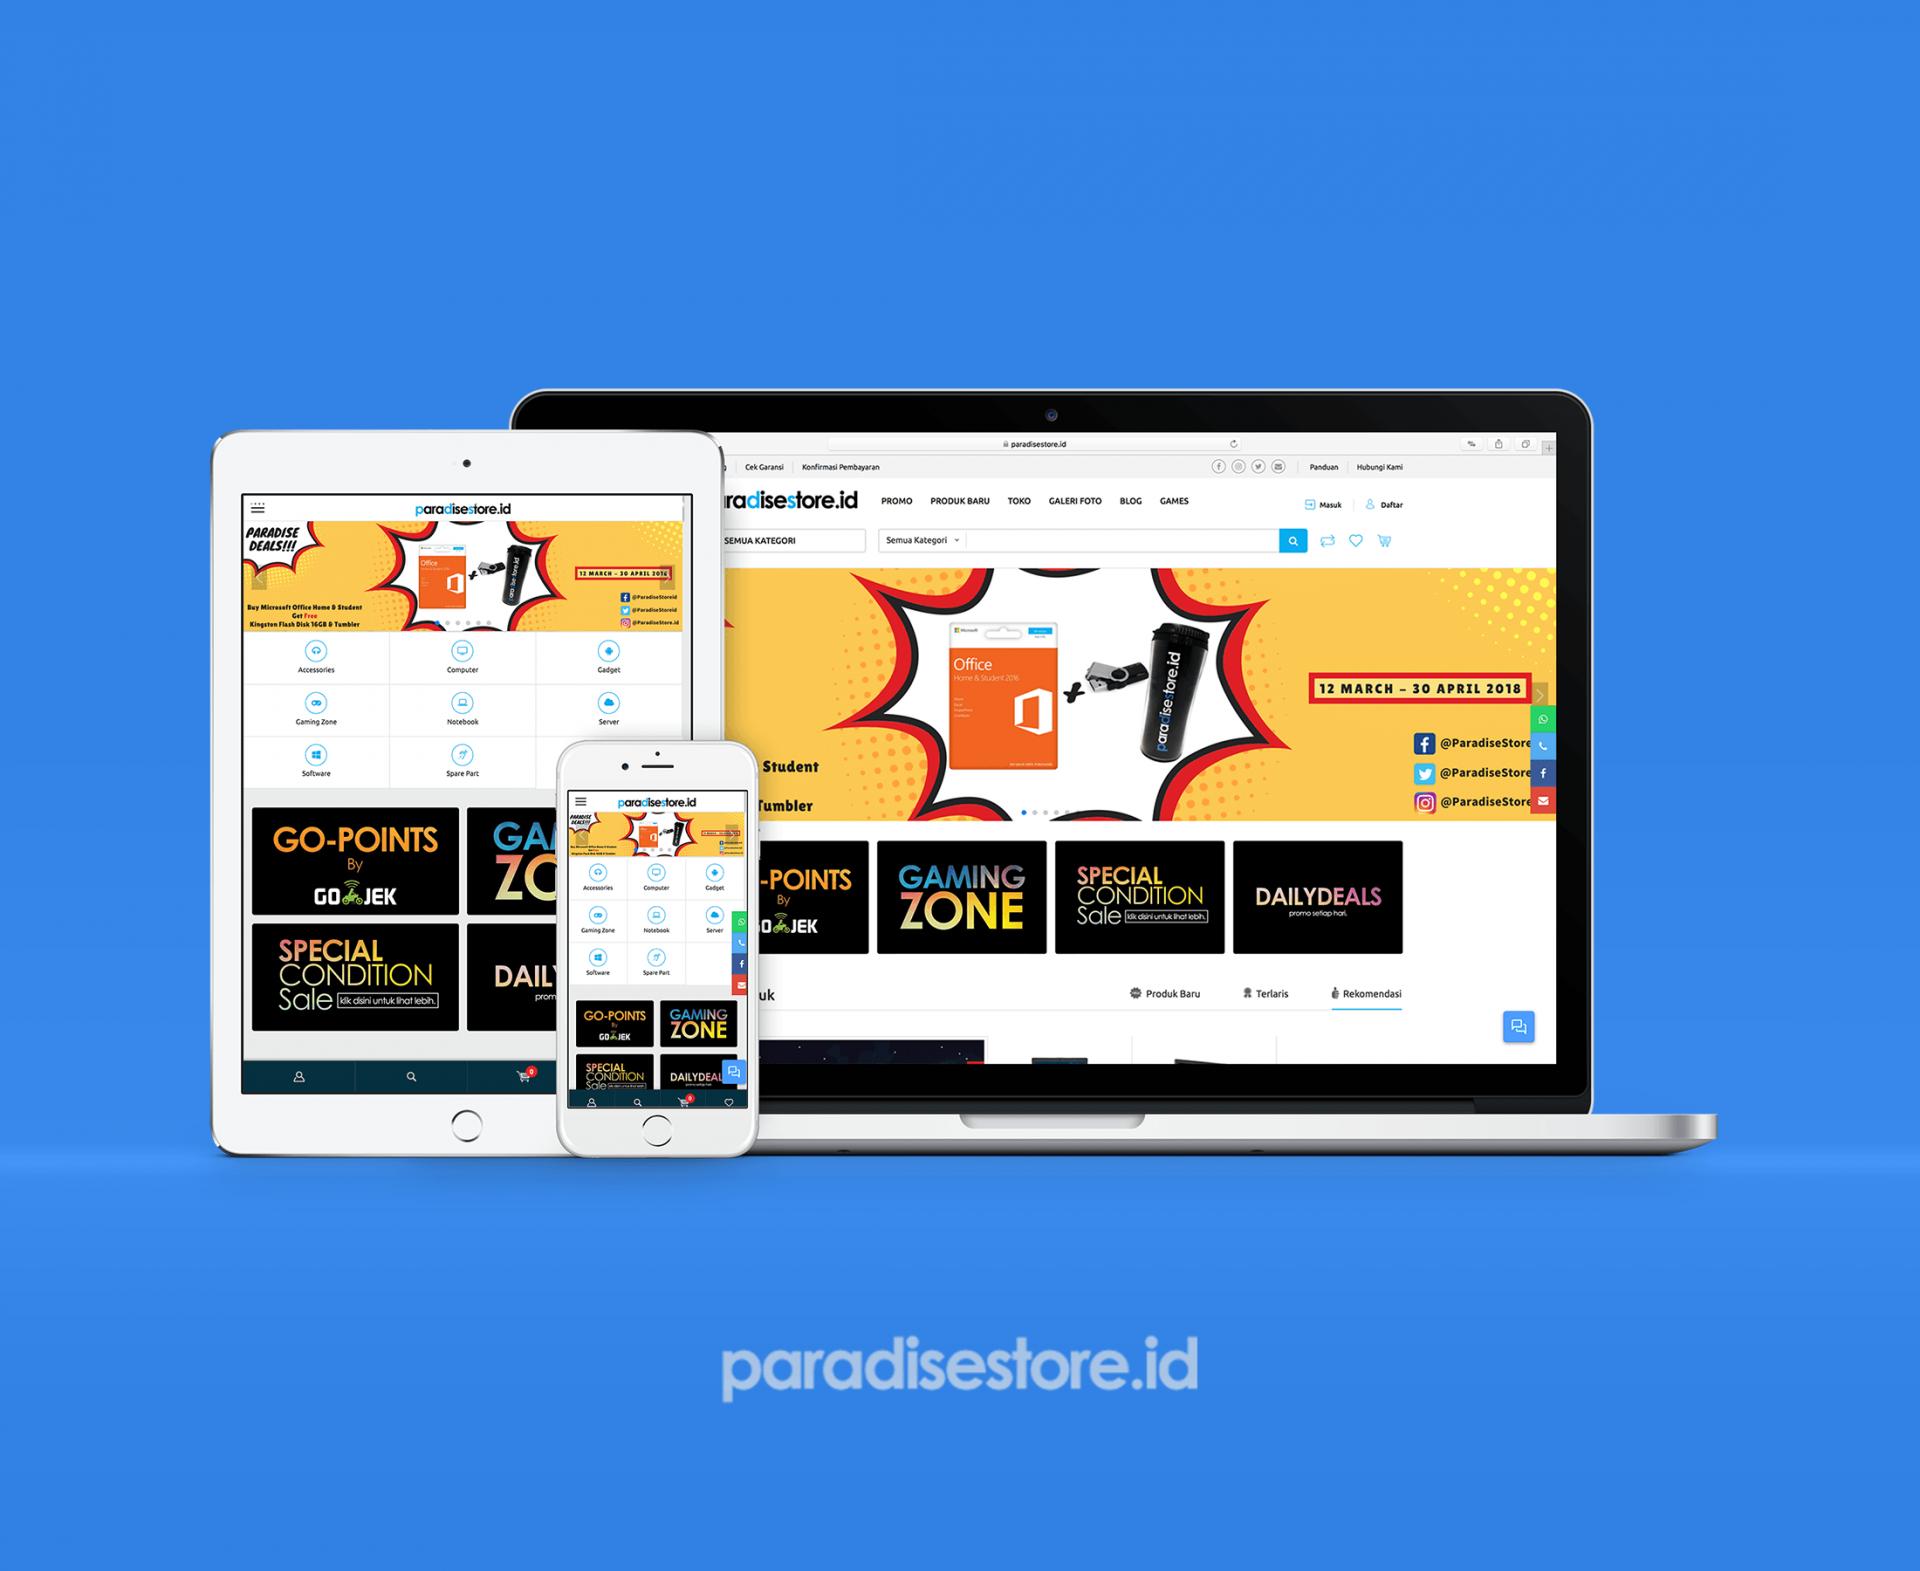 Paradise Store – ECommerce Development